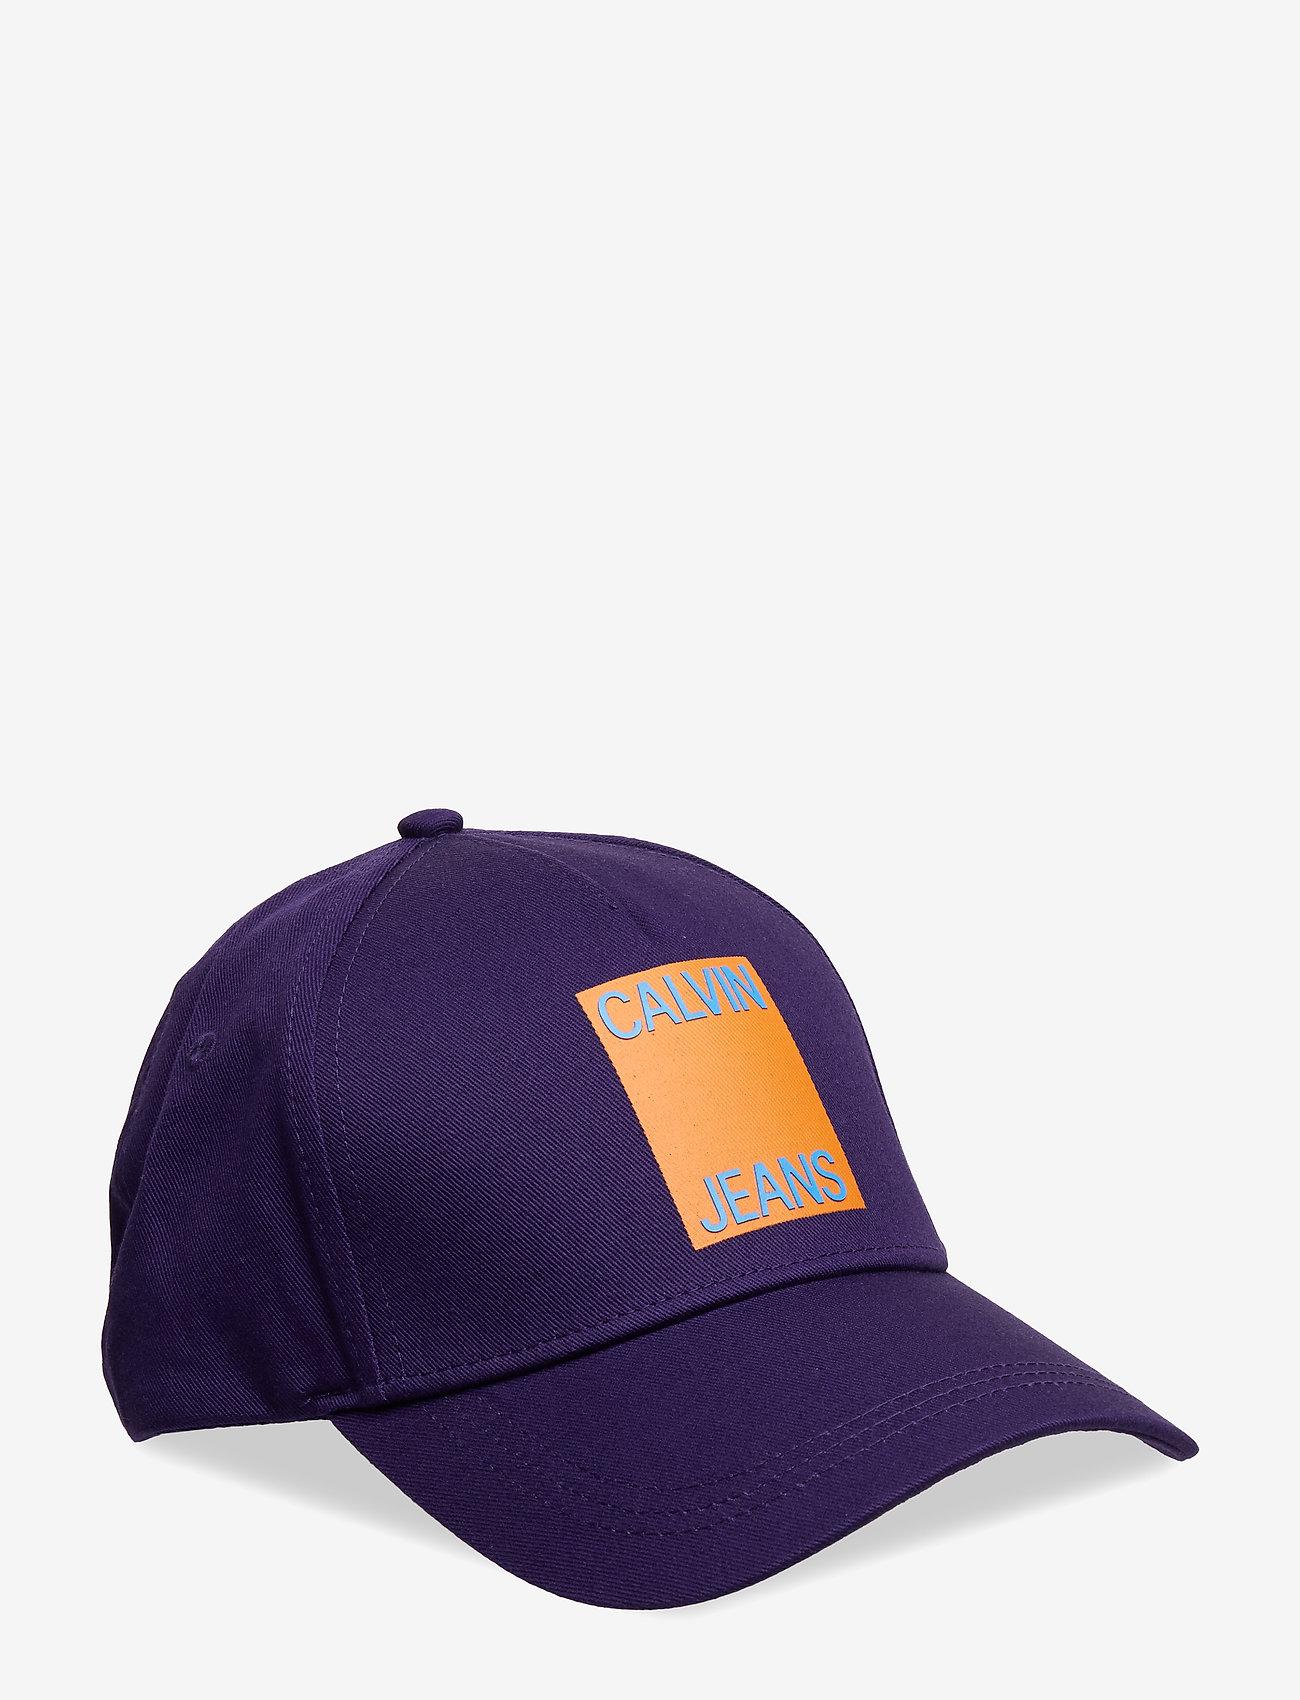 Calvin Klein - J CALVIN JEANS CAP - caps - parachute purple - 0